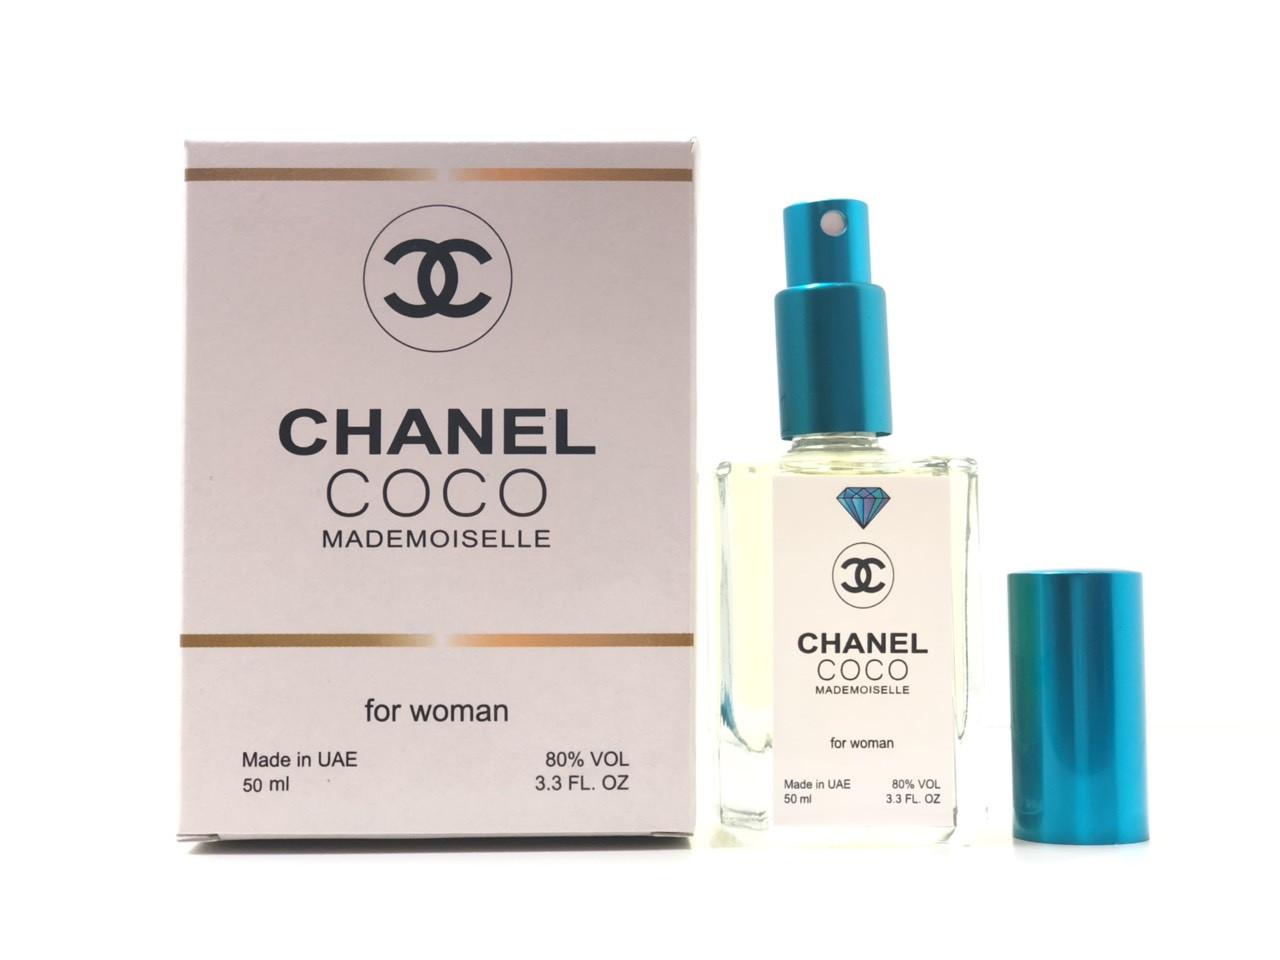 Парфюм Chanel Coco Mademoiselle (Шанель Коко Мадмуазель) 50 мл Diamond - реплика